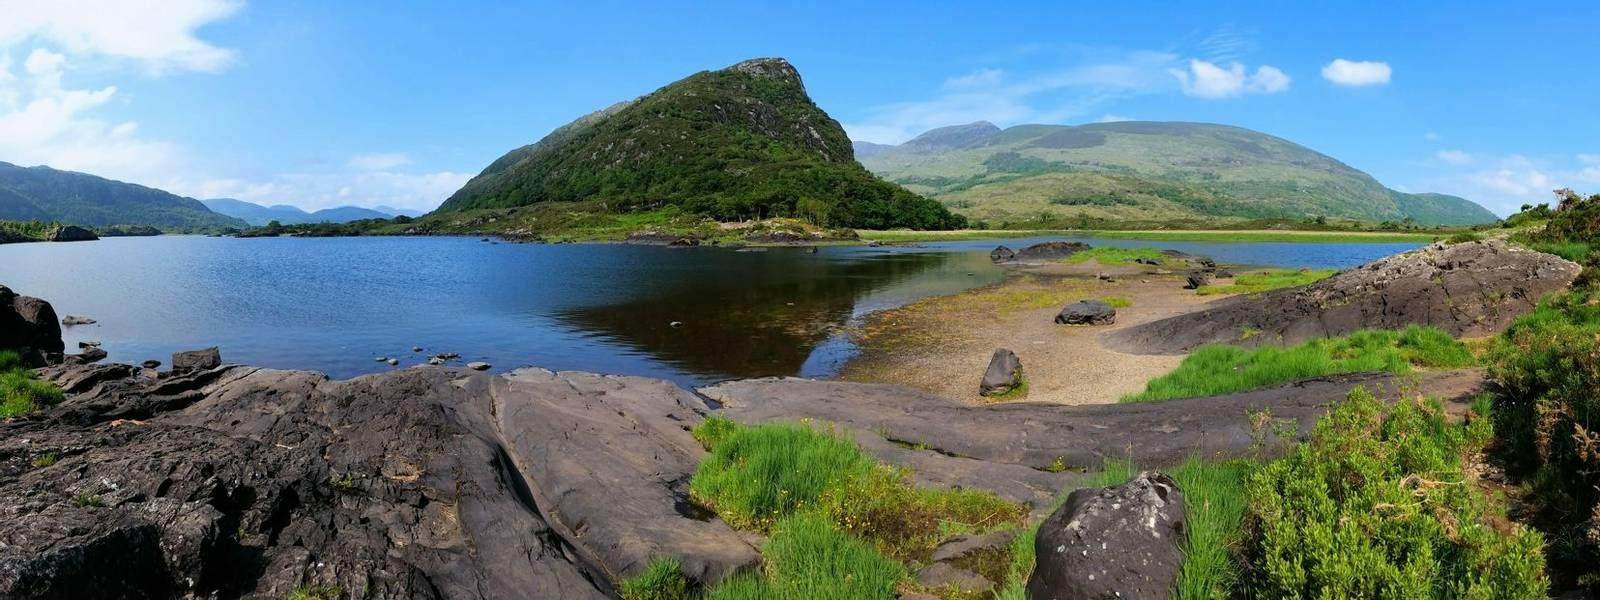 Ireland - Kenmare - - Killarney National Park - AdobeStock_252969647.jpeg